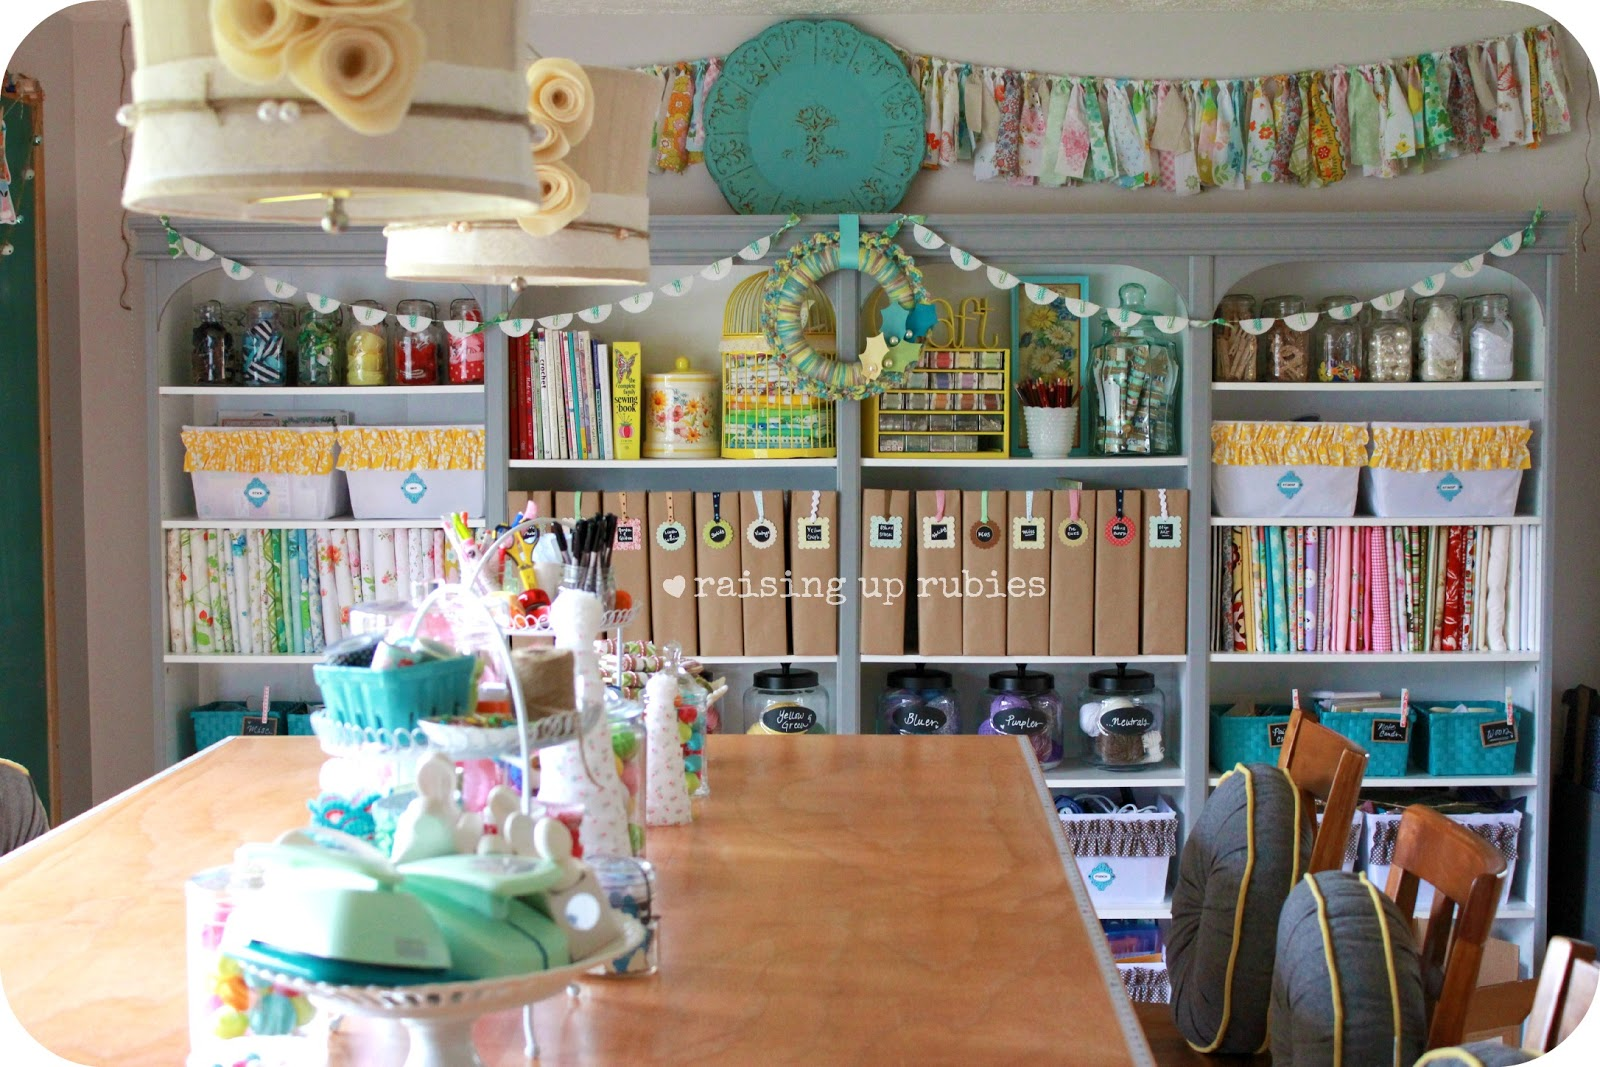 Raising Up Rubies- Blog: my craft room ... Christmas style